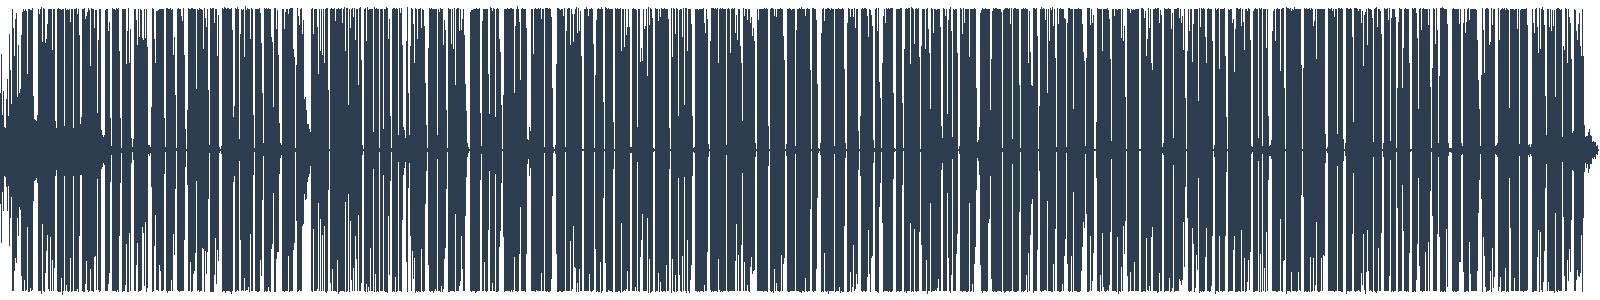 #8 Svetový realizmus (Maturita s Hashtagom) waveform